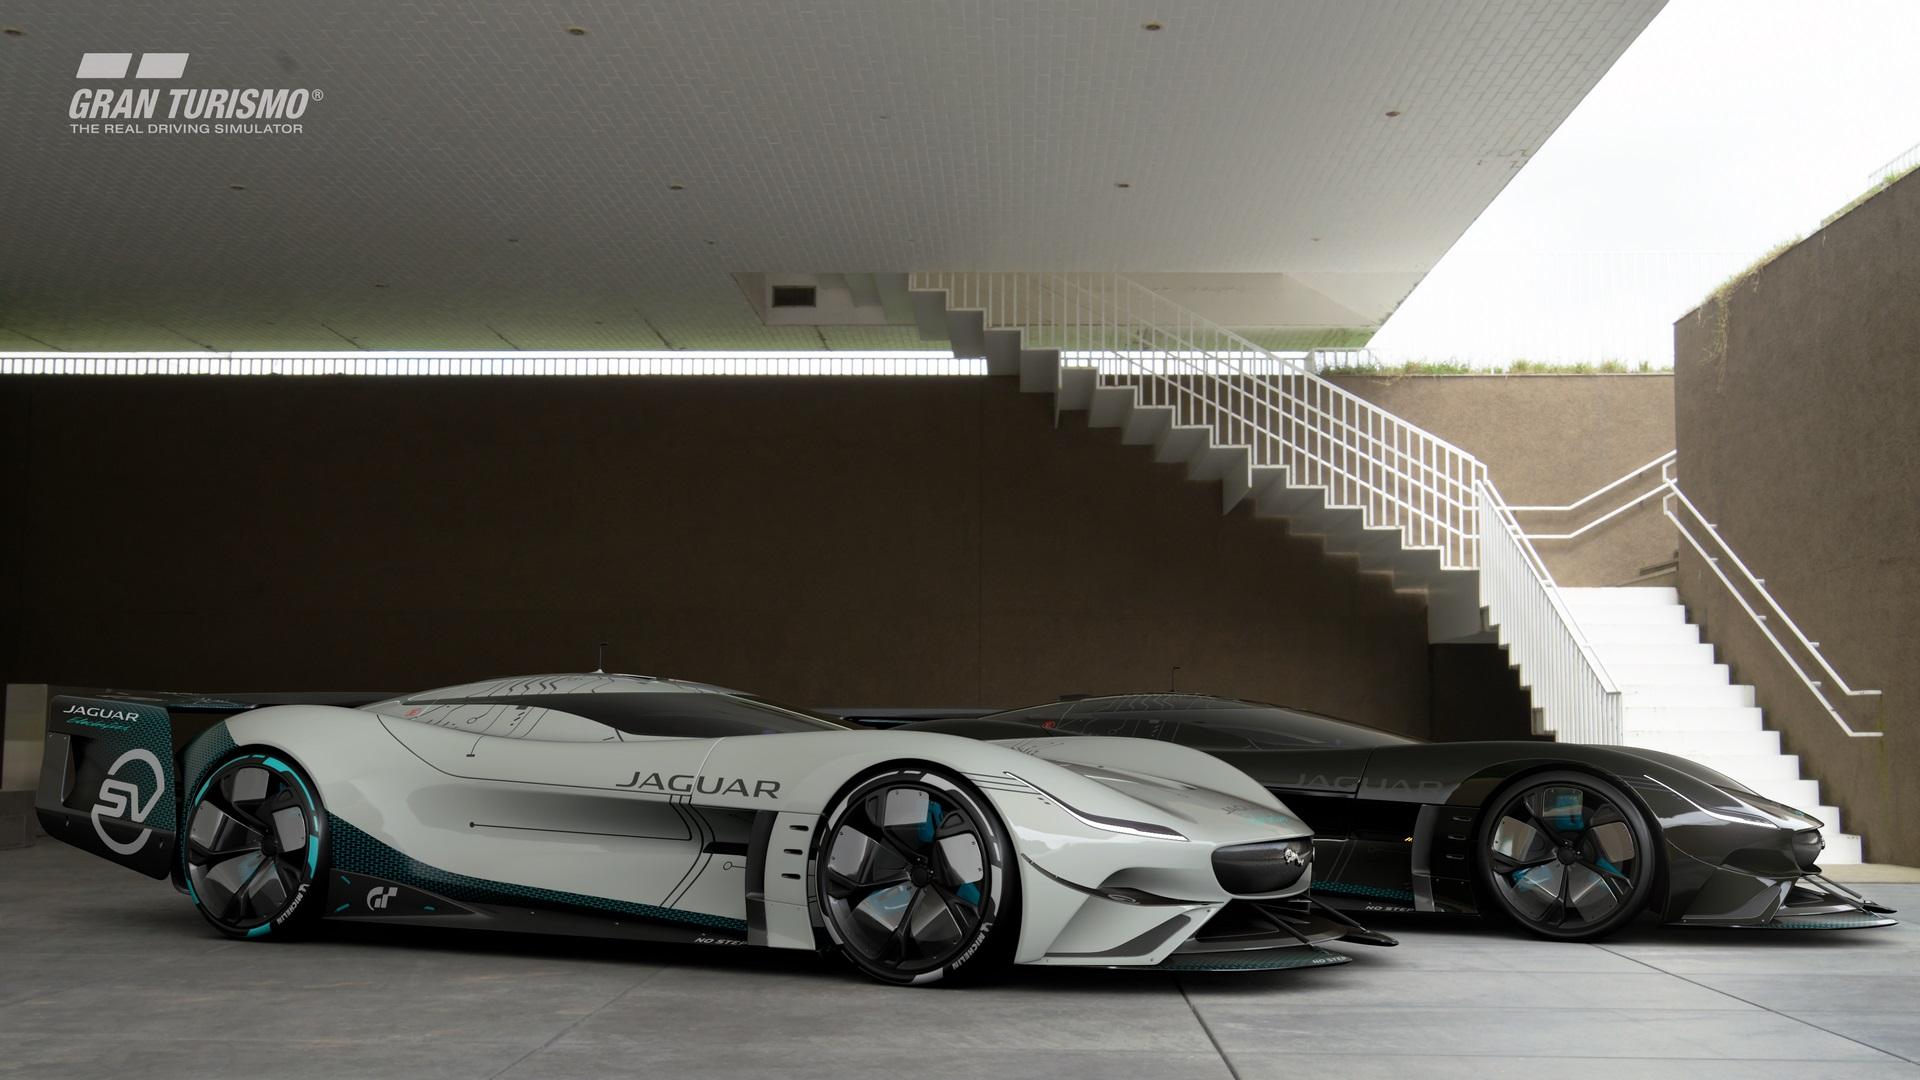 Jaguar-Vision-Gran-Turismo-SV-2